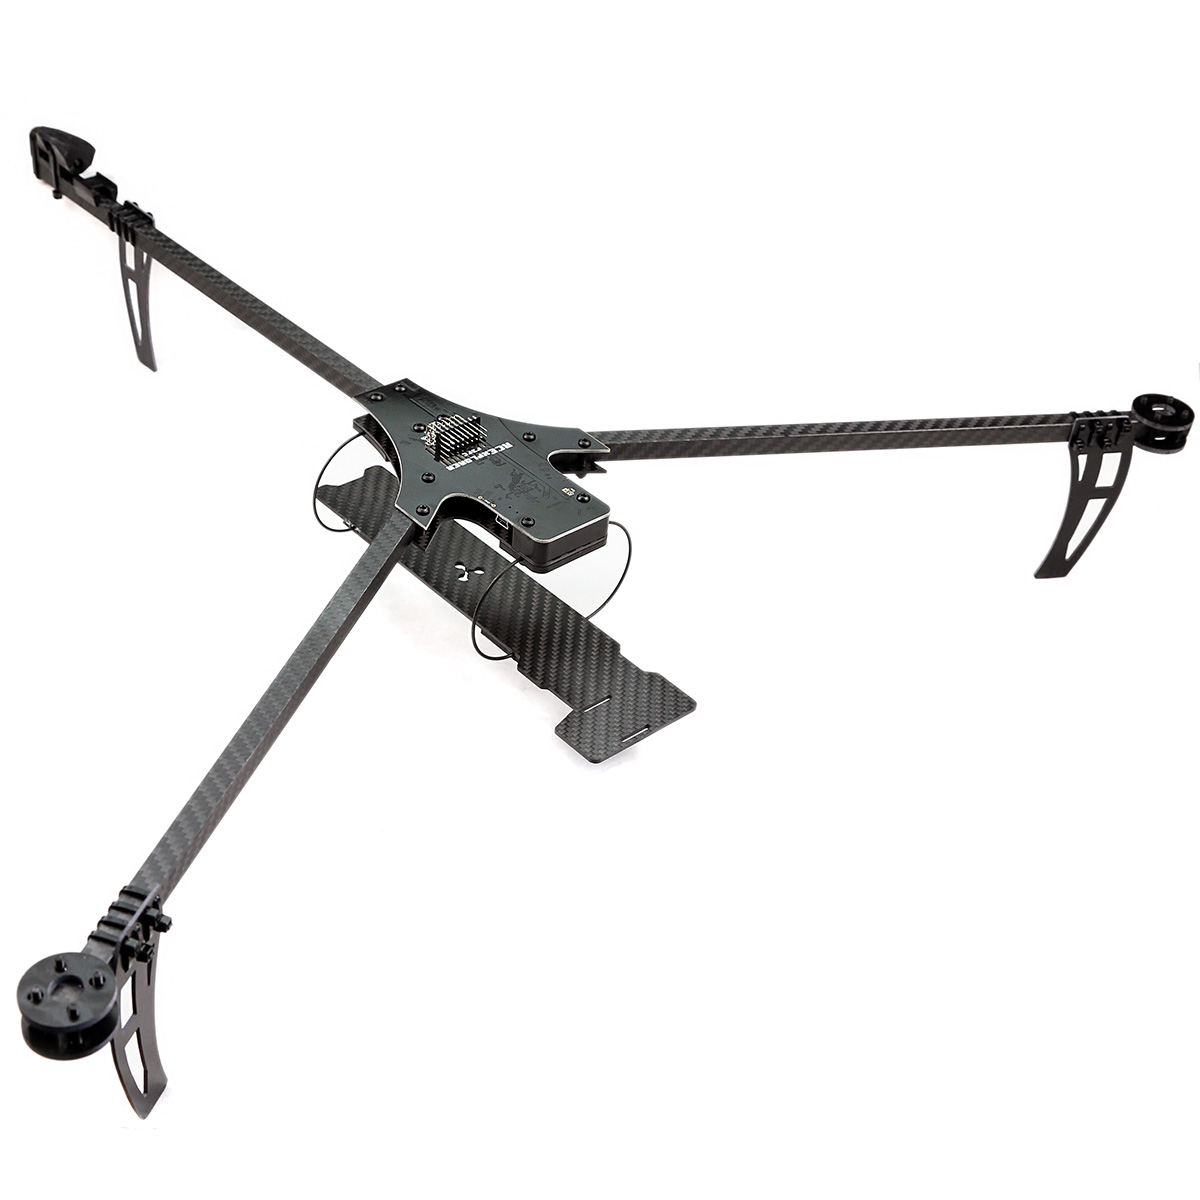 Tricopter scratch build | flite test.